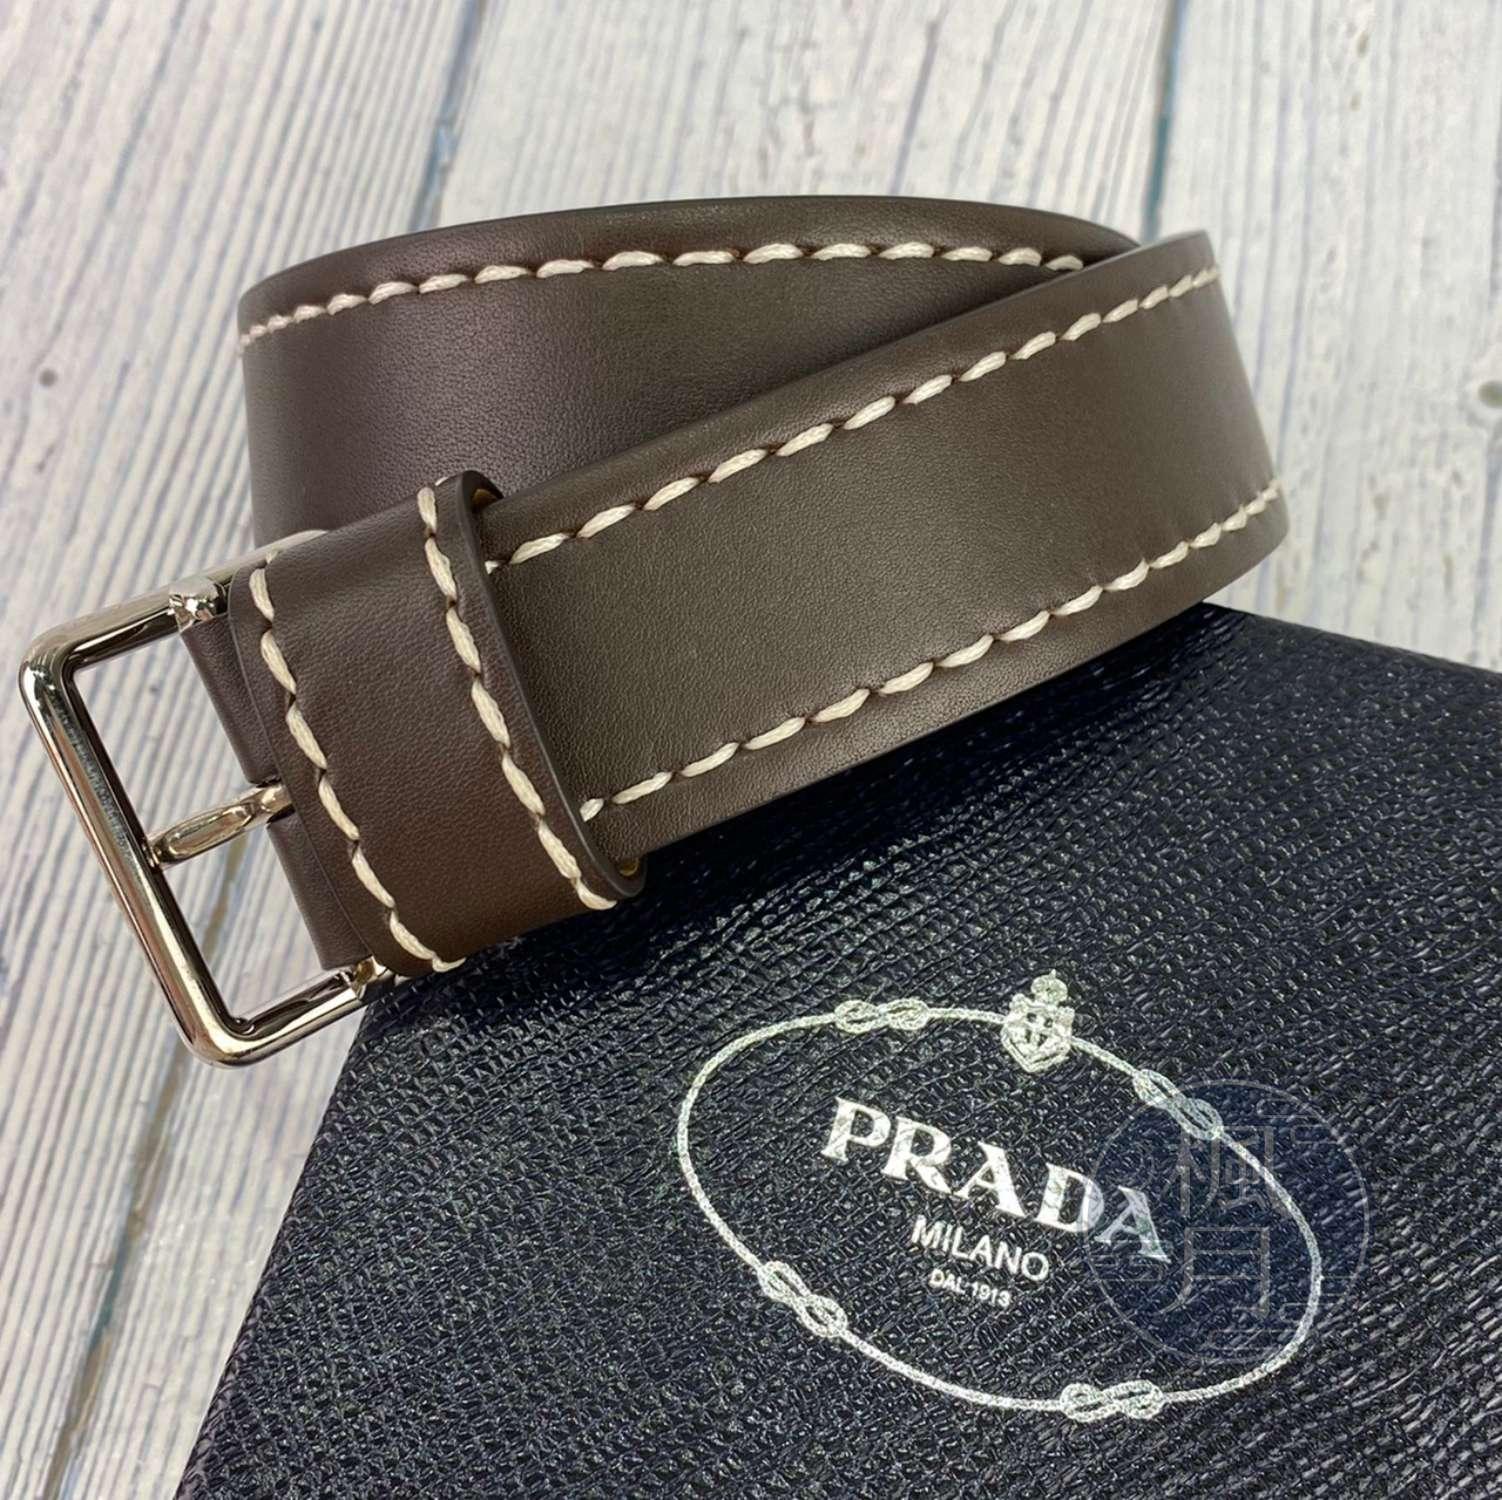 BRAND楓月 PRADA 普拉達 咖啡色 皮革 縫線 男用 皮帶 服飾配件 腰帶 金屬 #90